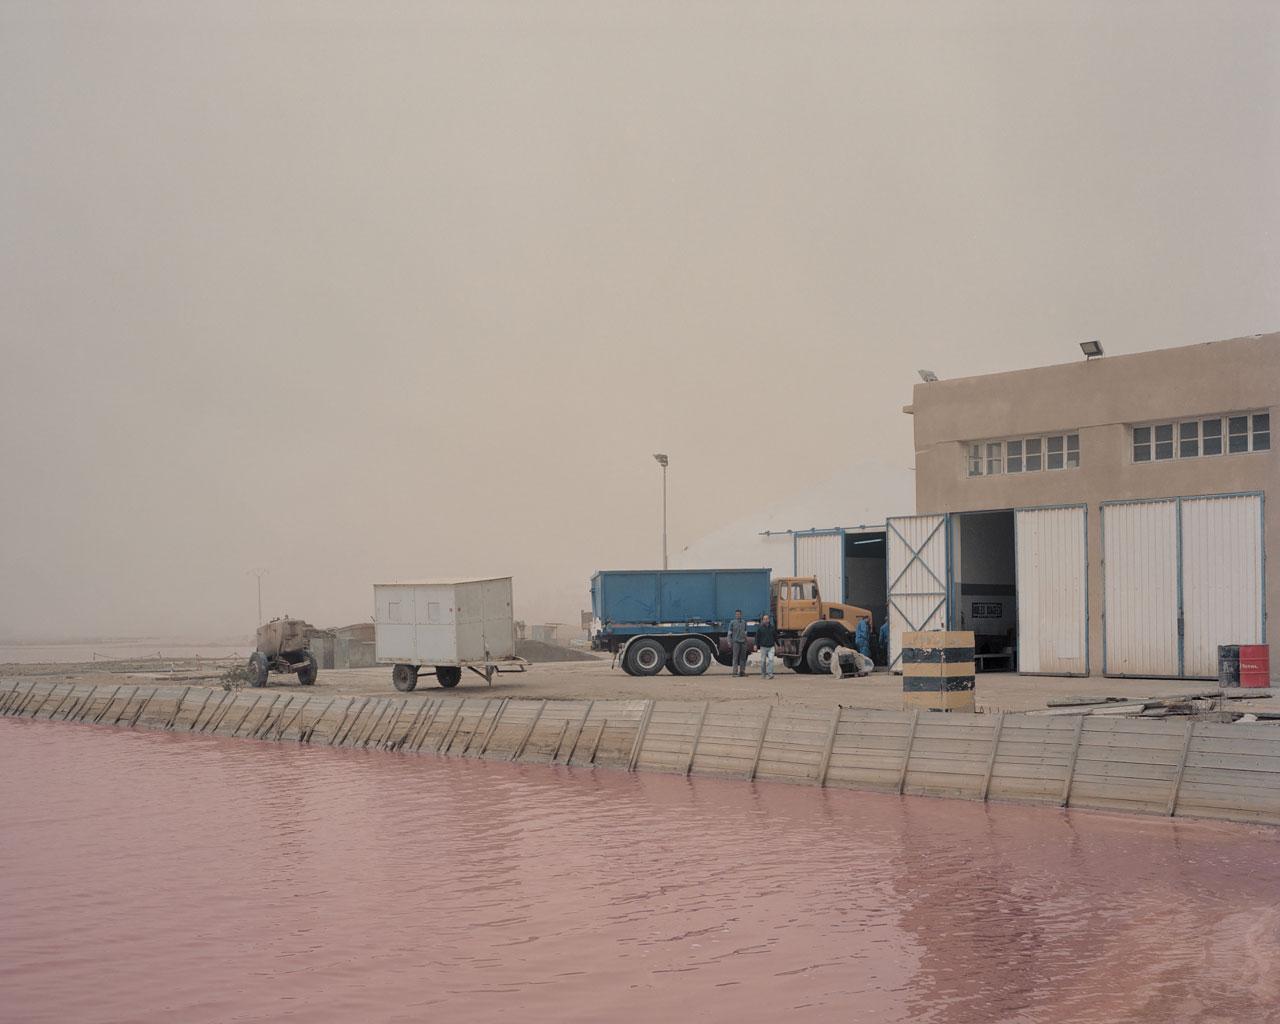 Cargo, Salines of Sfax, Tunisia - Photo by Ákos Major